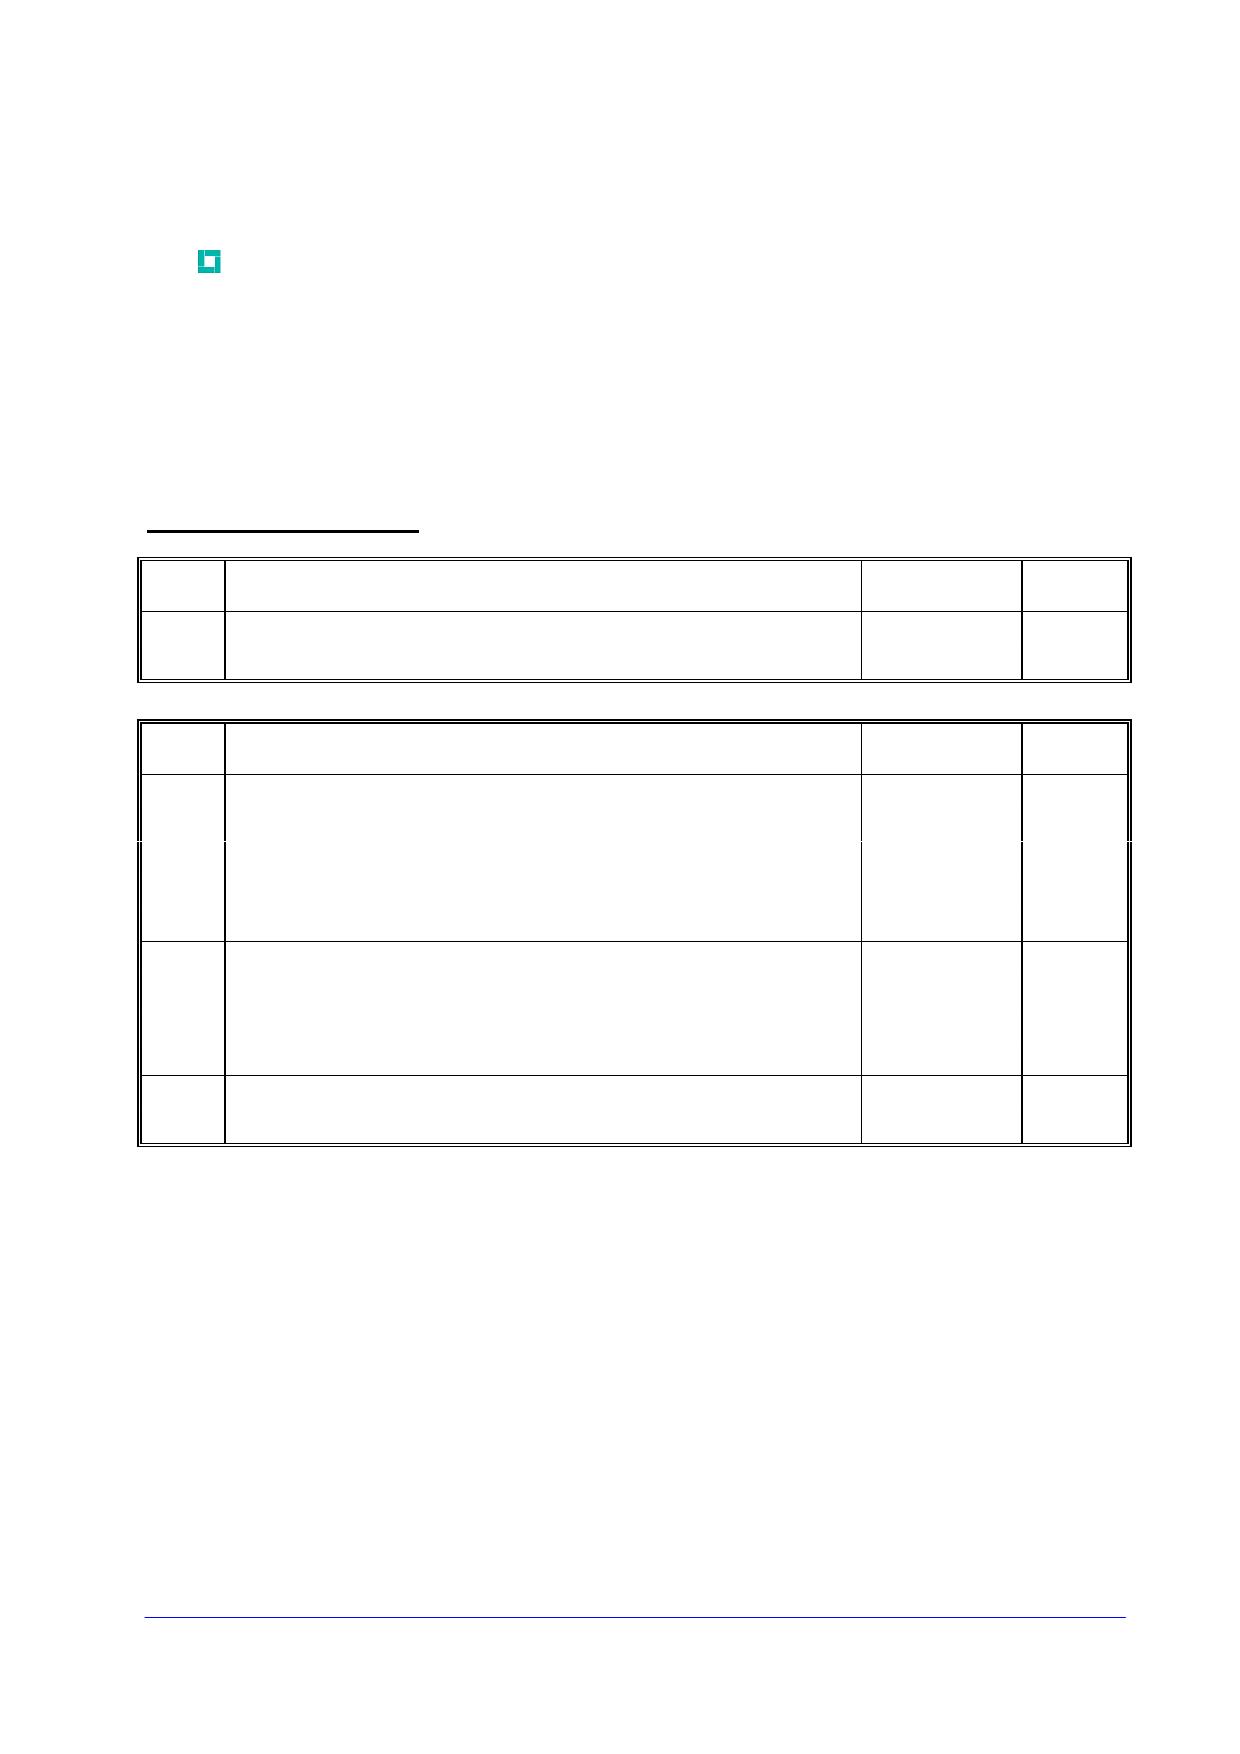 M0367WC140 دیتاشیت PDF